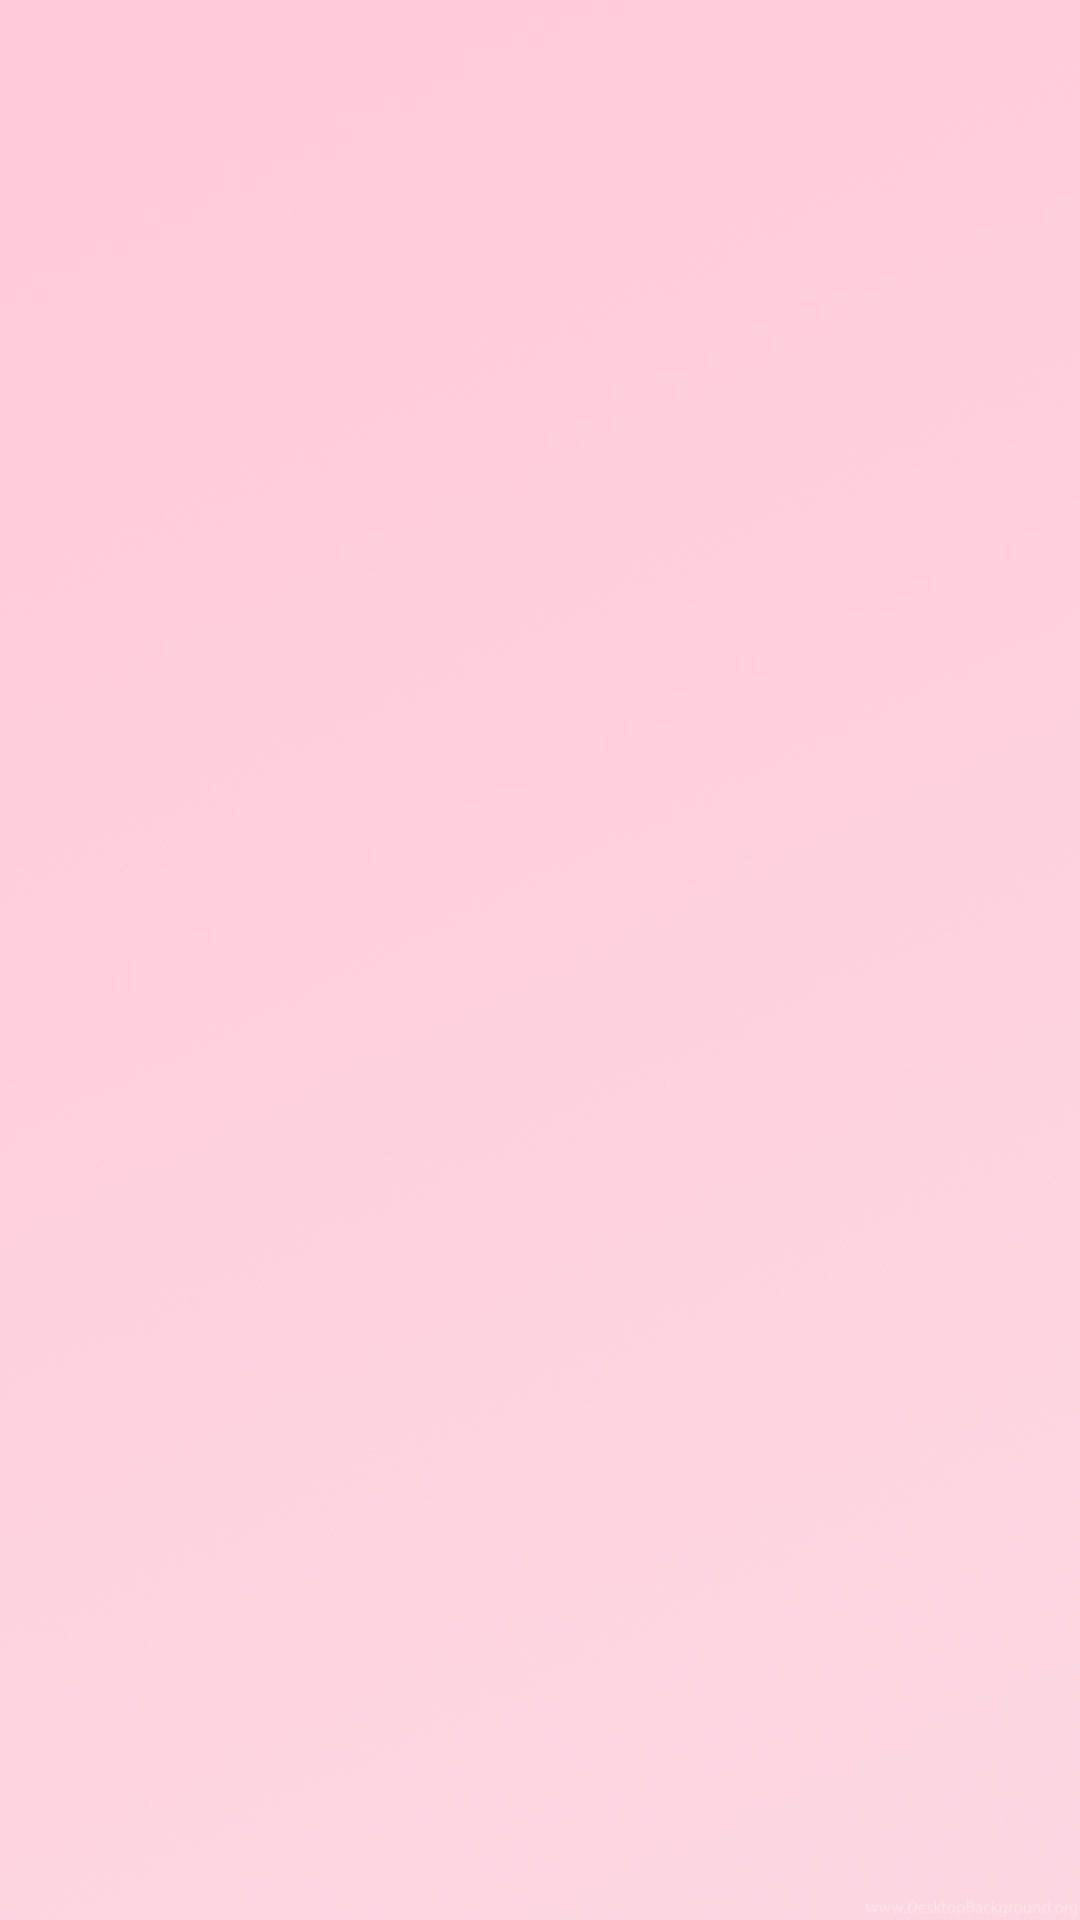 Iphone X Glitter Wallpaper Download Plain Pink Iphone 5 6 Wallpapers Ipod Wallpapers Desktop